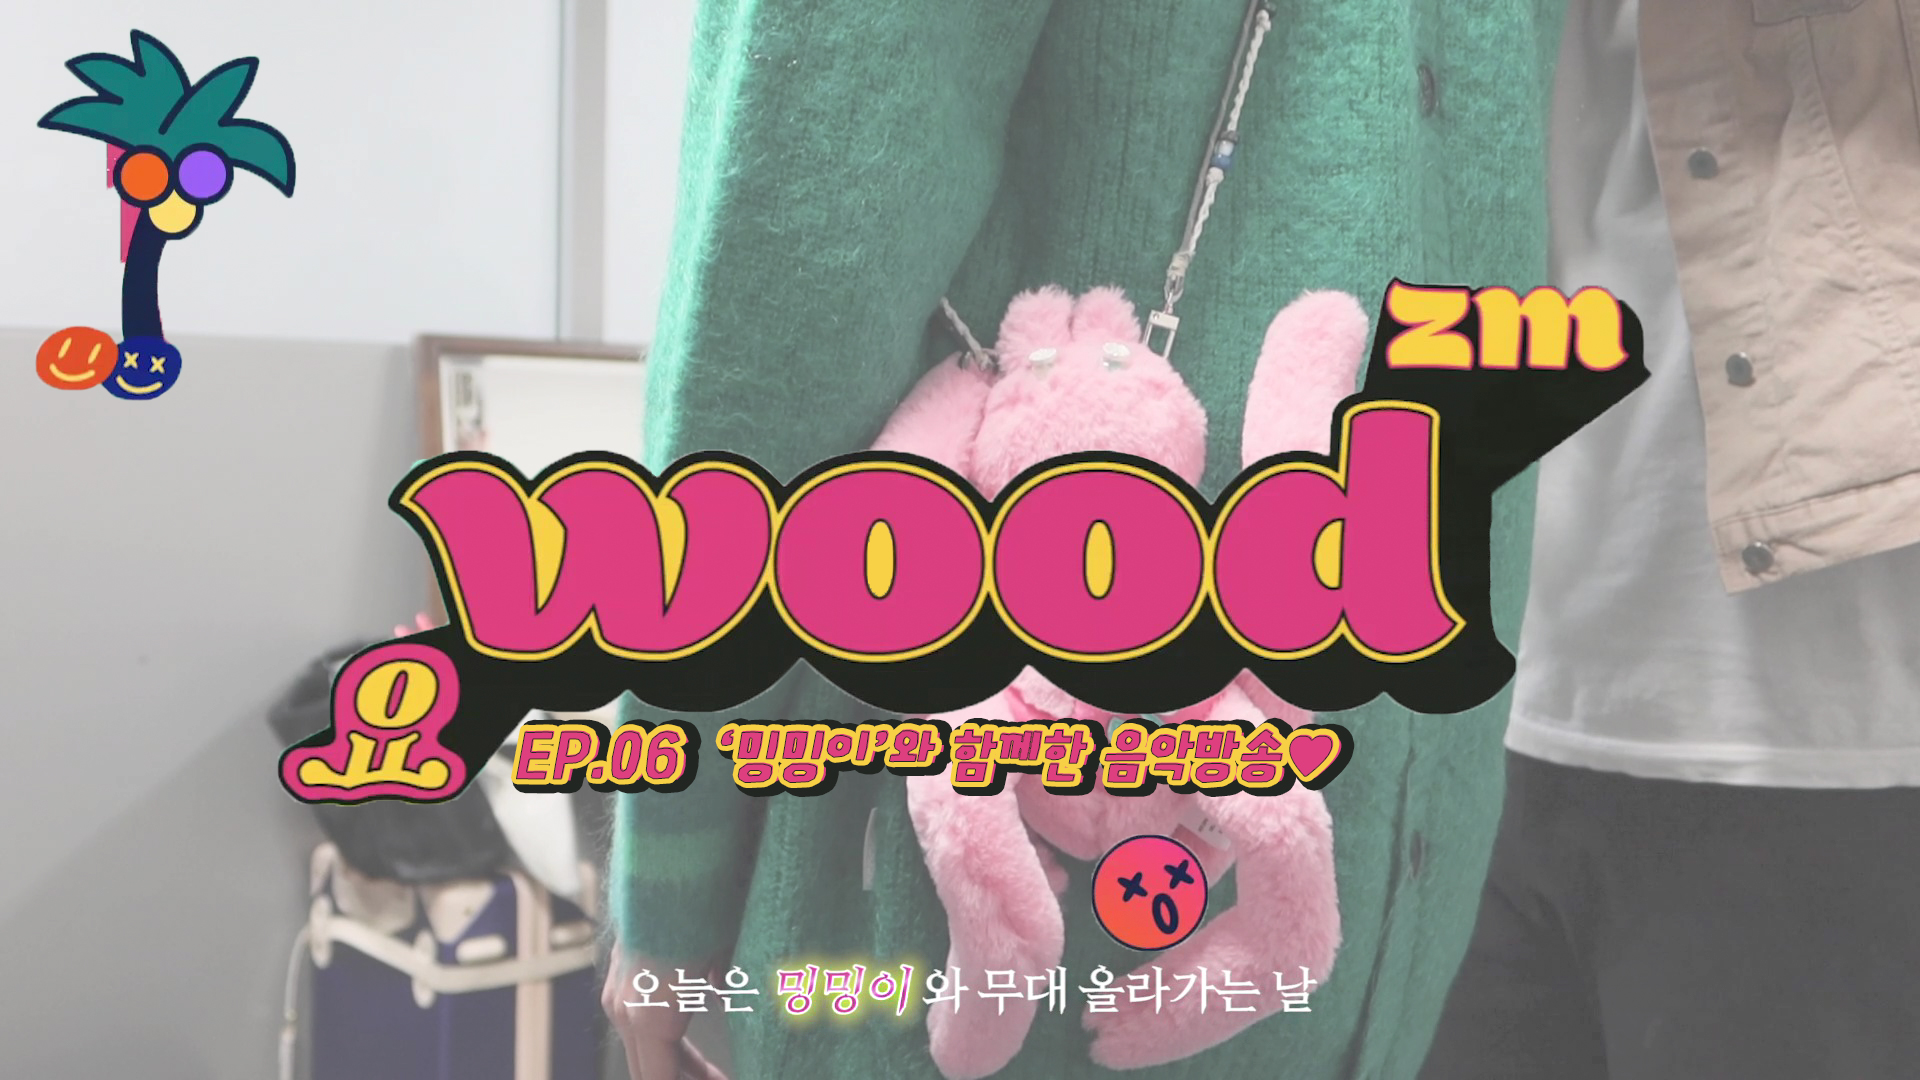 WOODZ - 요WOODZM (YOWOODZM) S2. EP.06